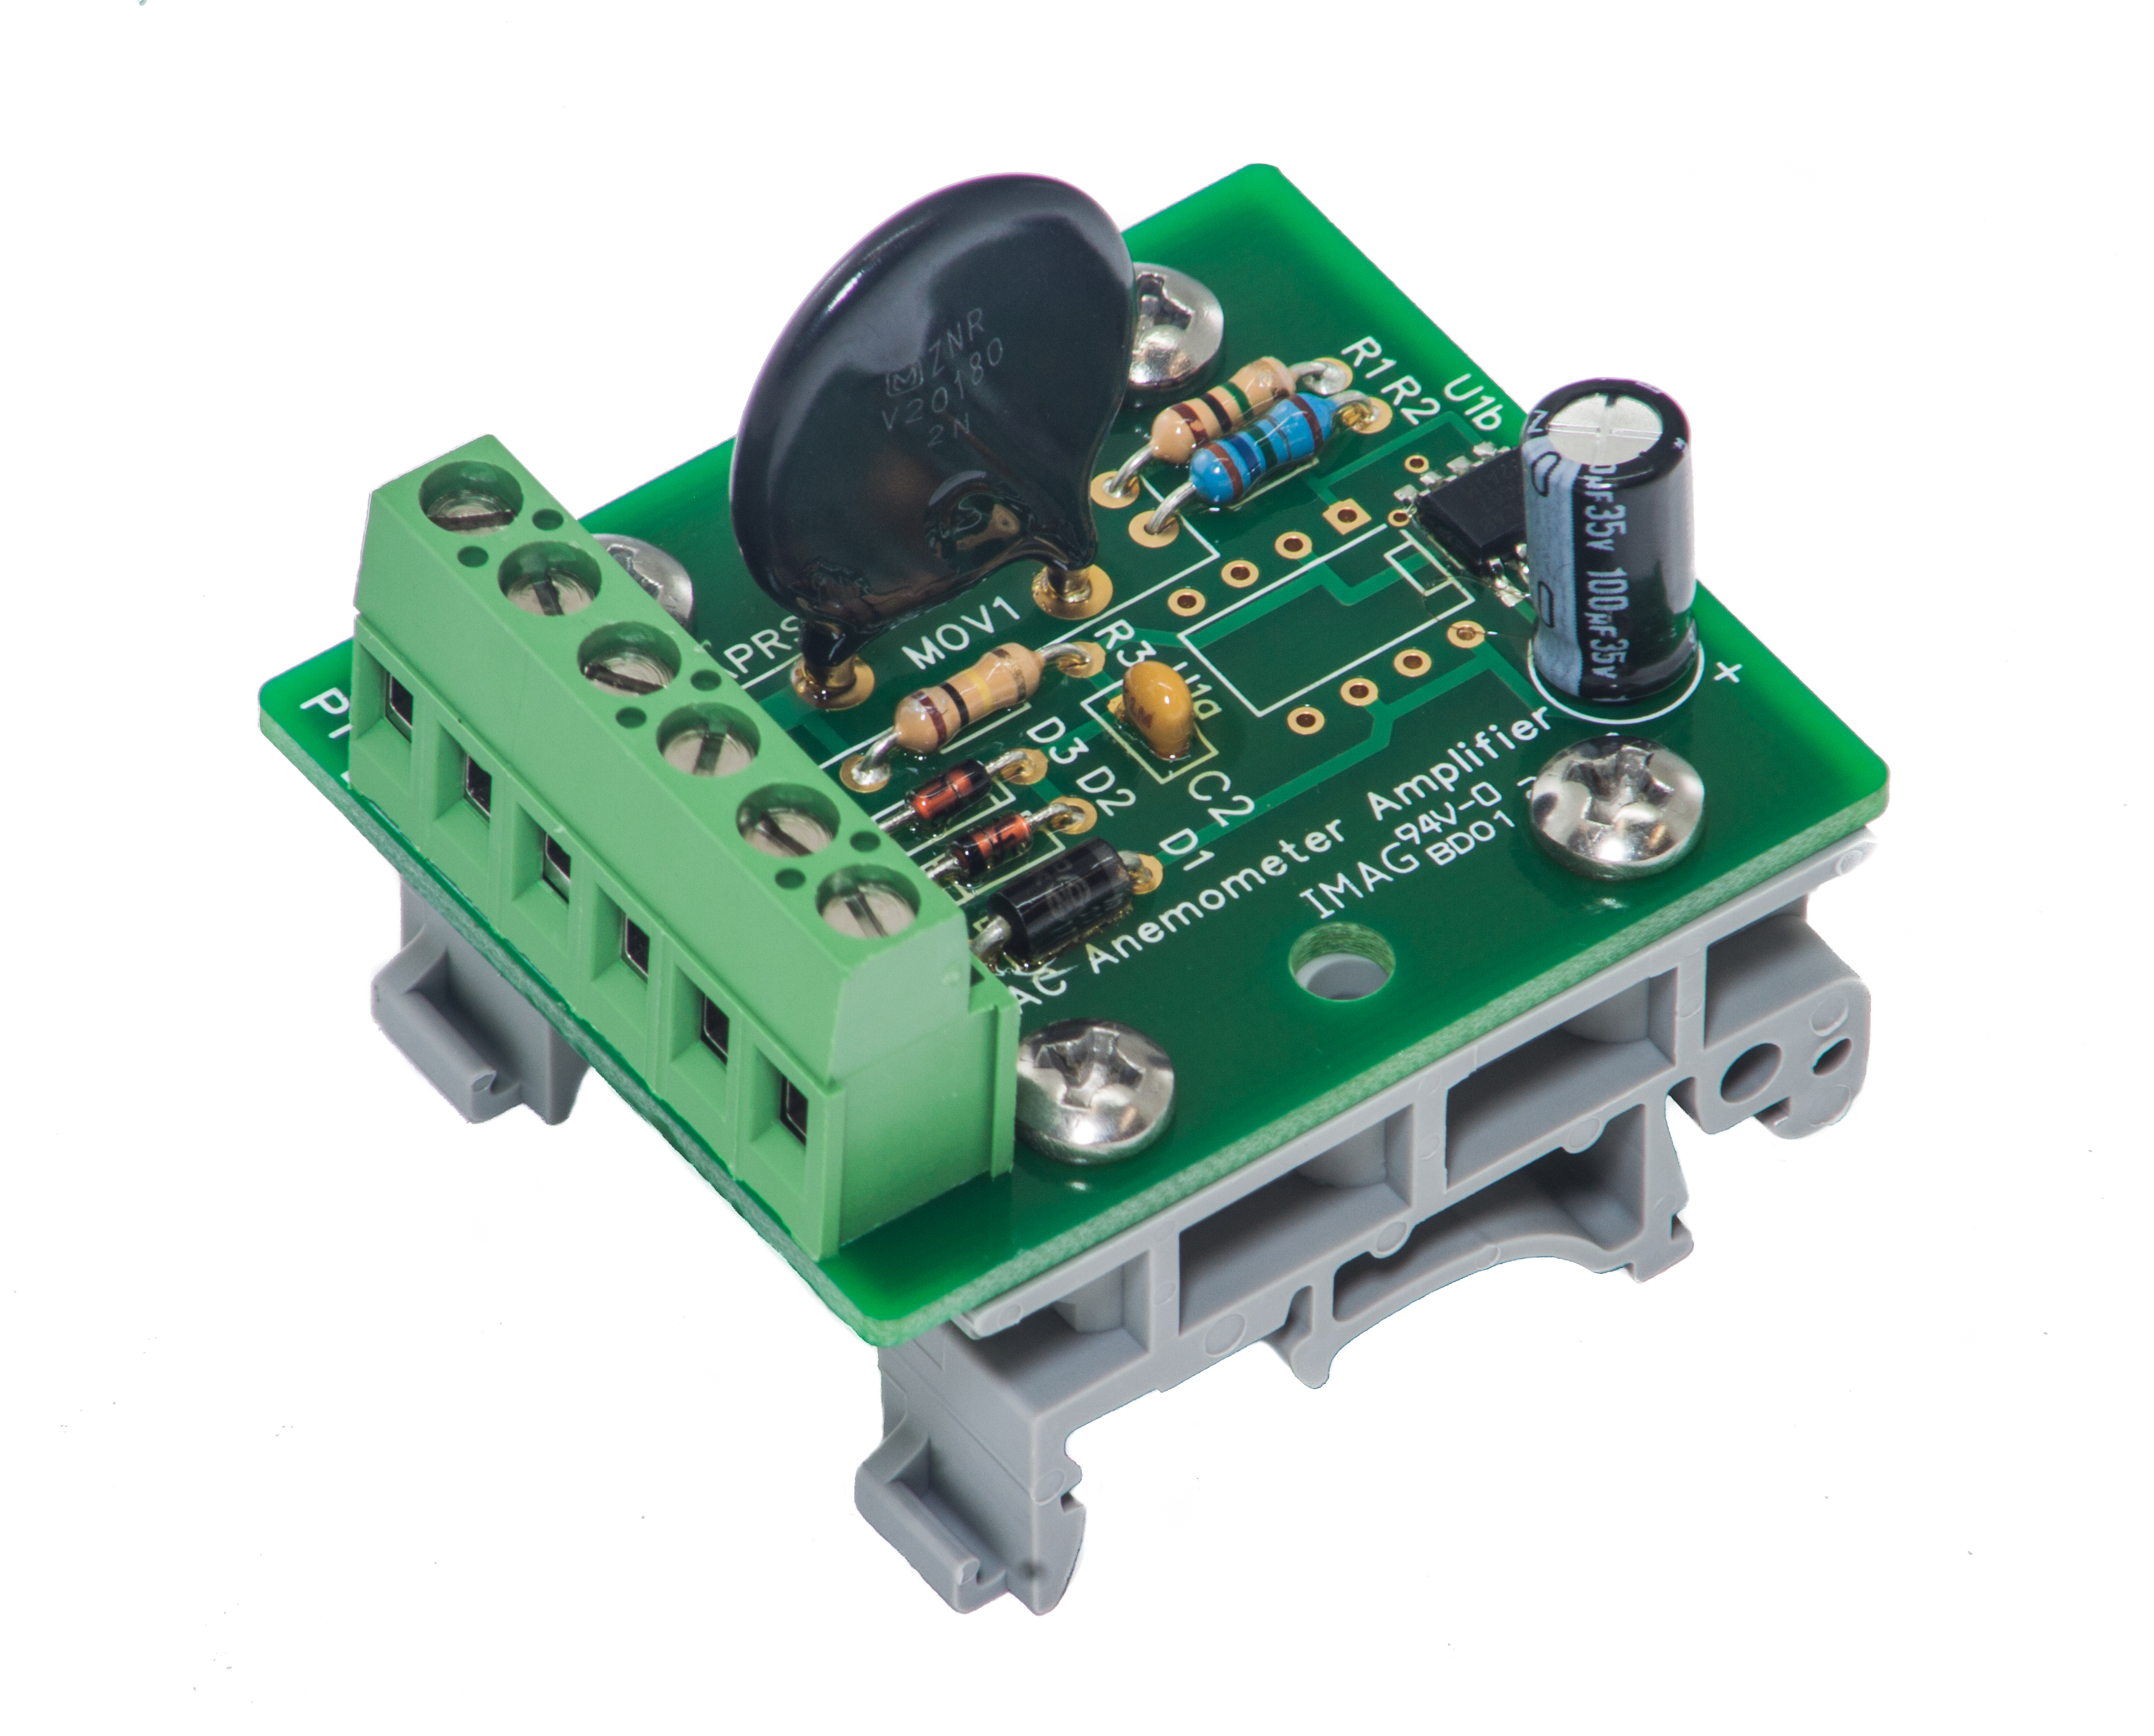 aprs6511 ac anemometer amplifier board view full size view slideshow [ 3365 x 2712 Pixel ]